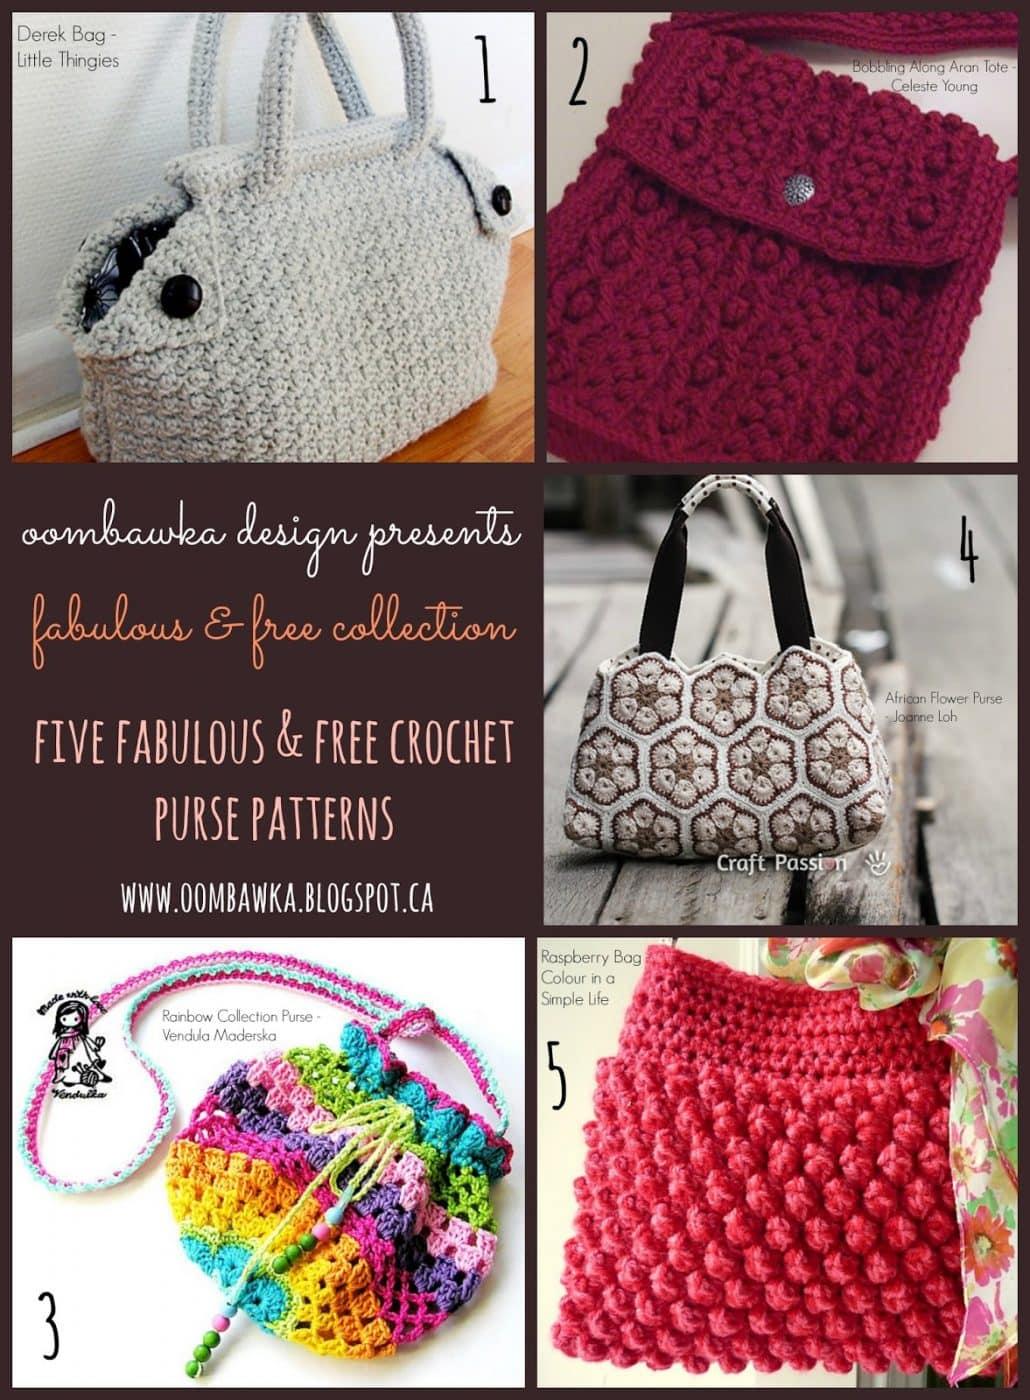 5 Fabulous & Free Crochet Purse Patterns Oombawka Design ...